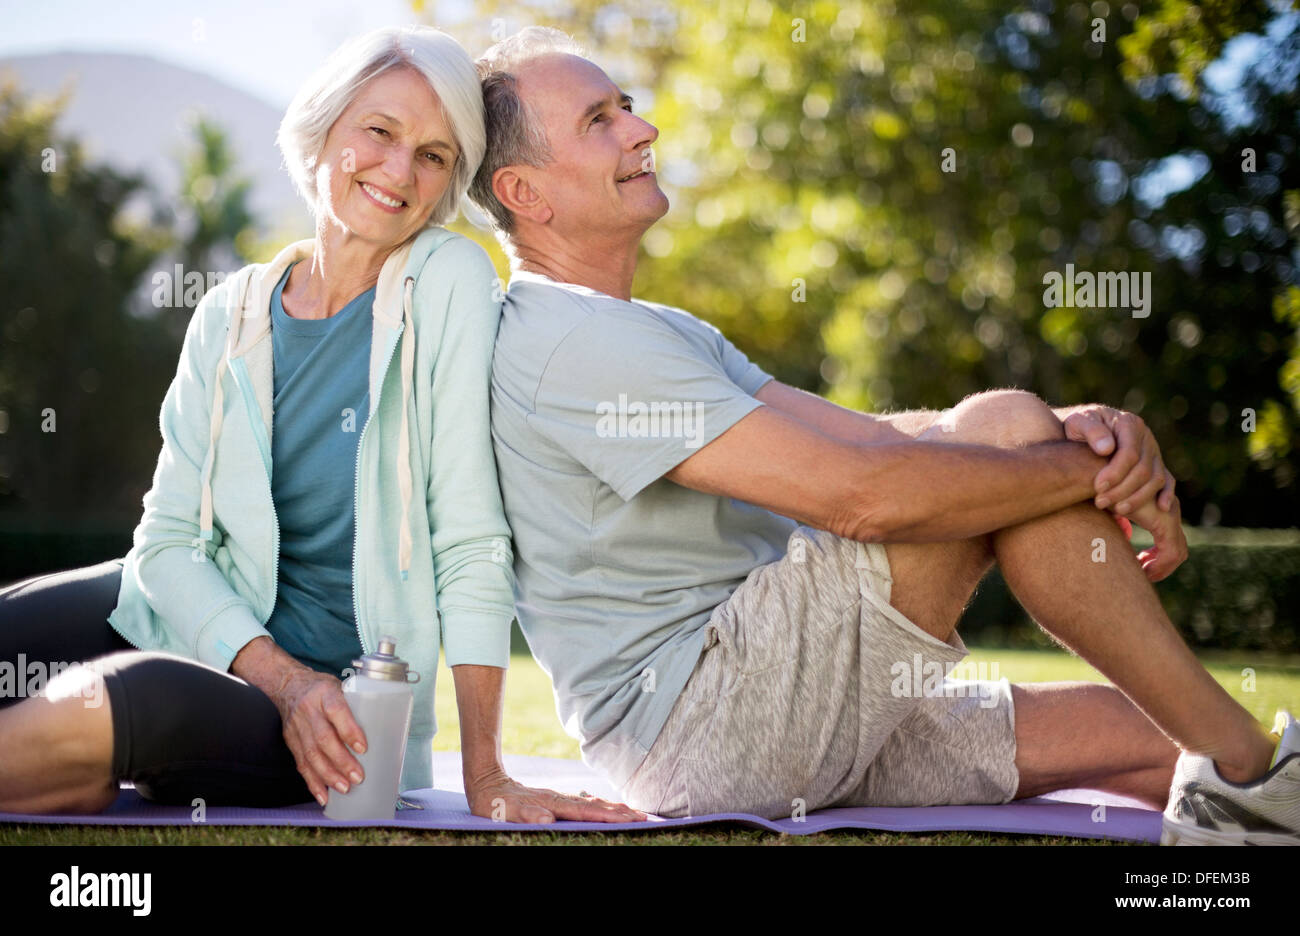 Älteres Paar auf Yoga-Matte im Park sitzend Stockbild